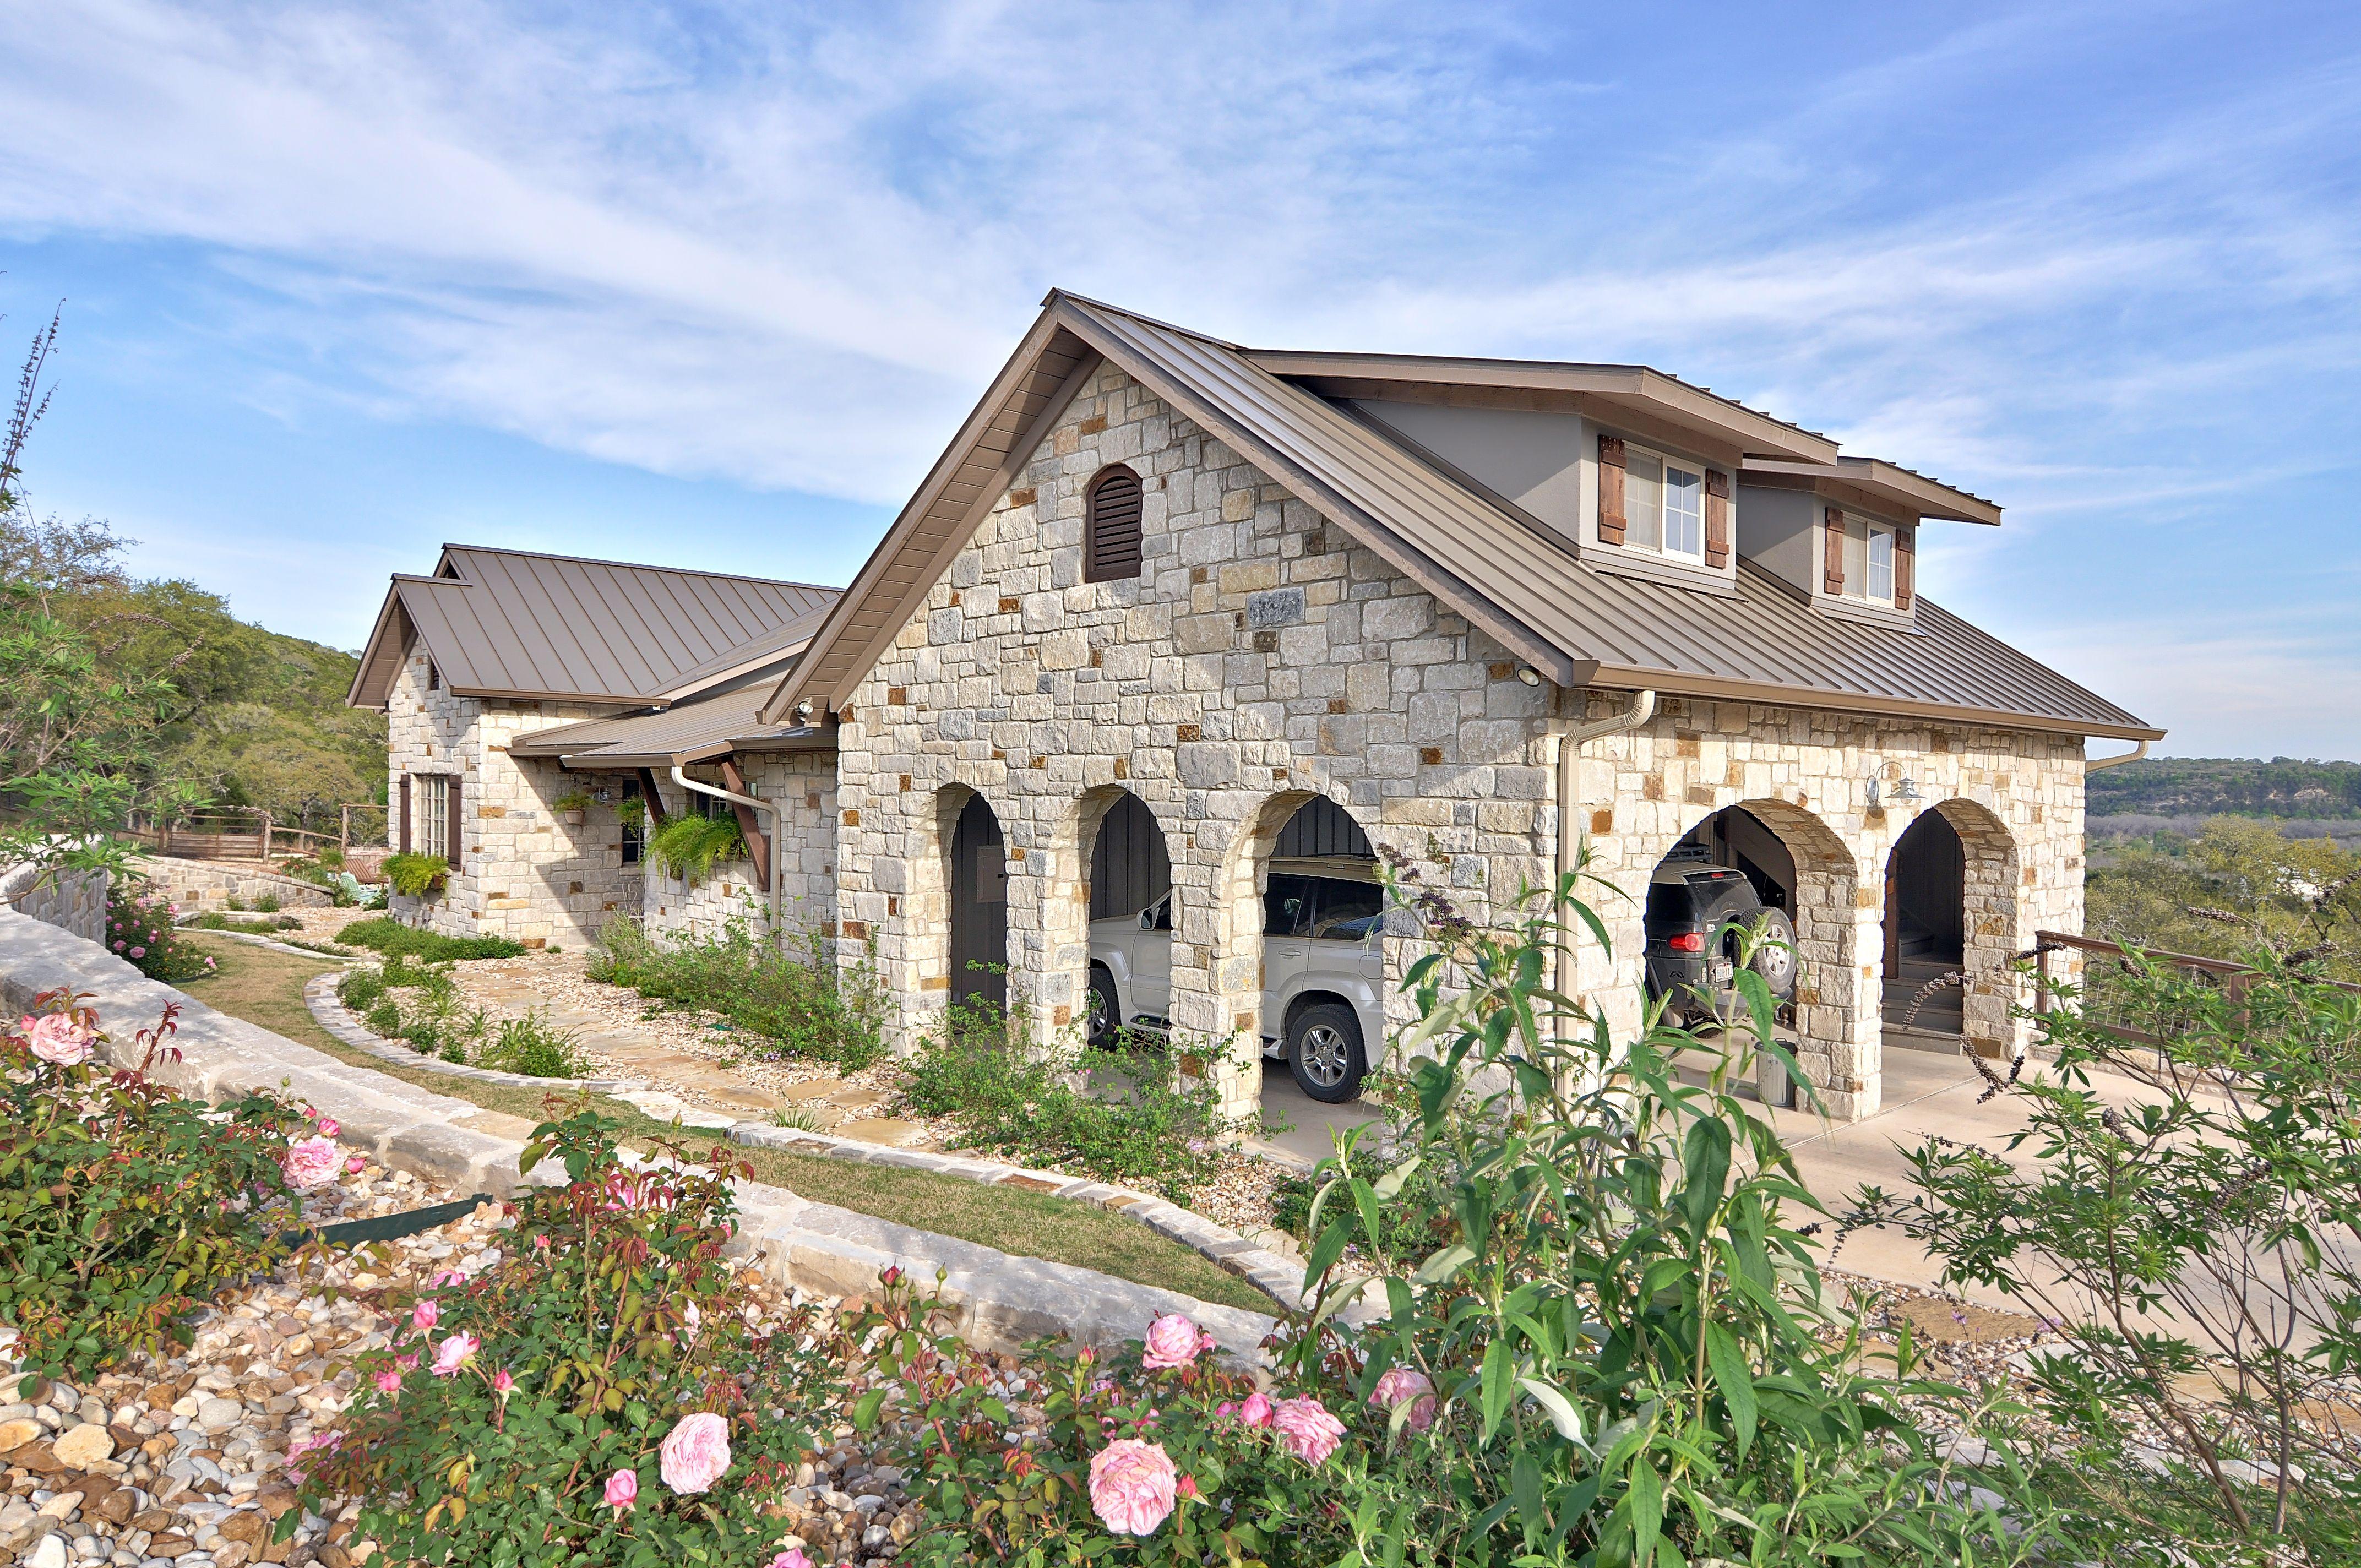 Drexel Metals Medium Bronze Hill County Texas Metal Roof Colors Facade House Roof Colors